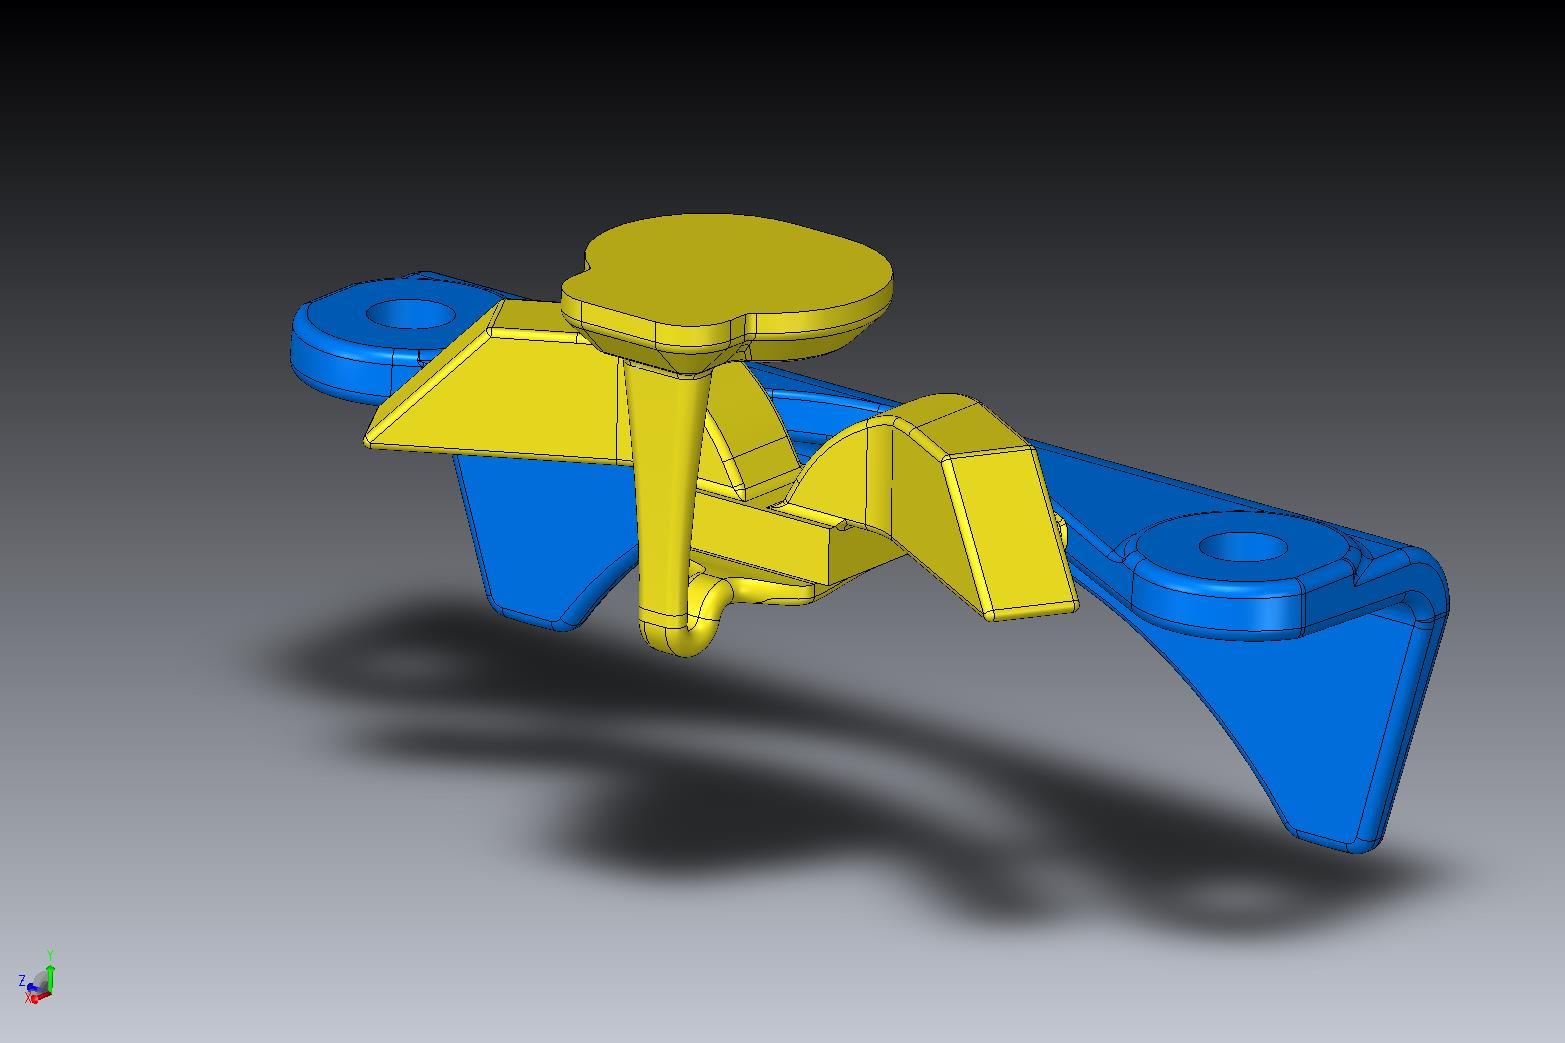 3D printing processes - Wikipedia